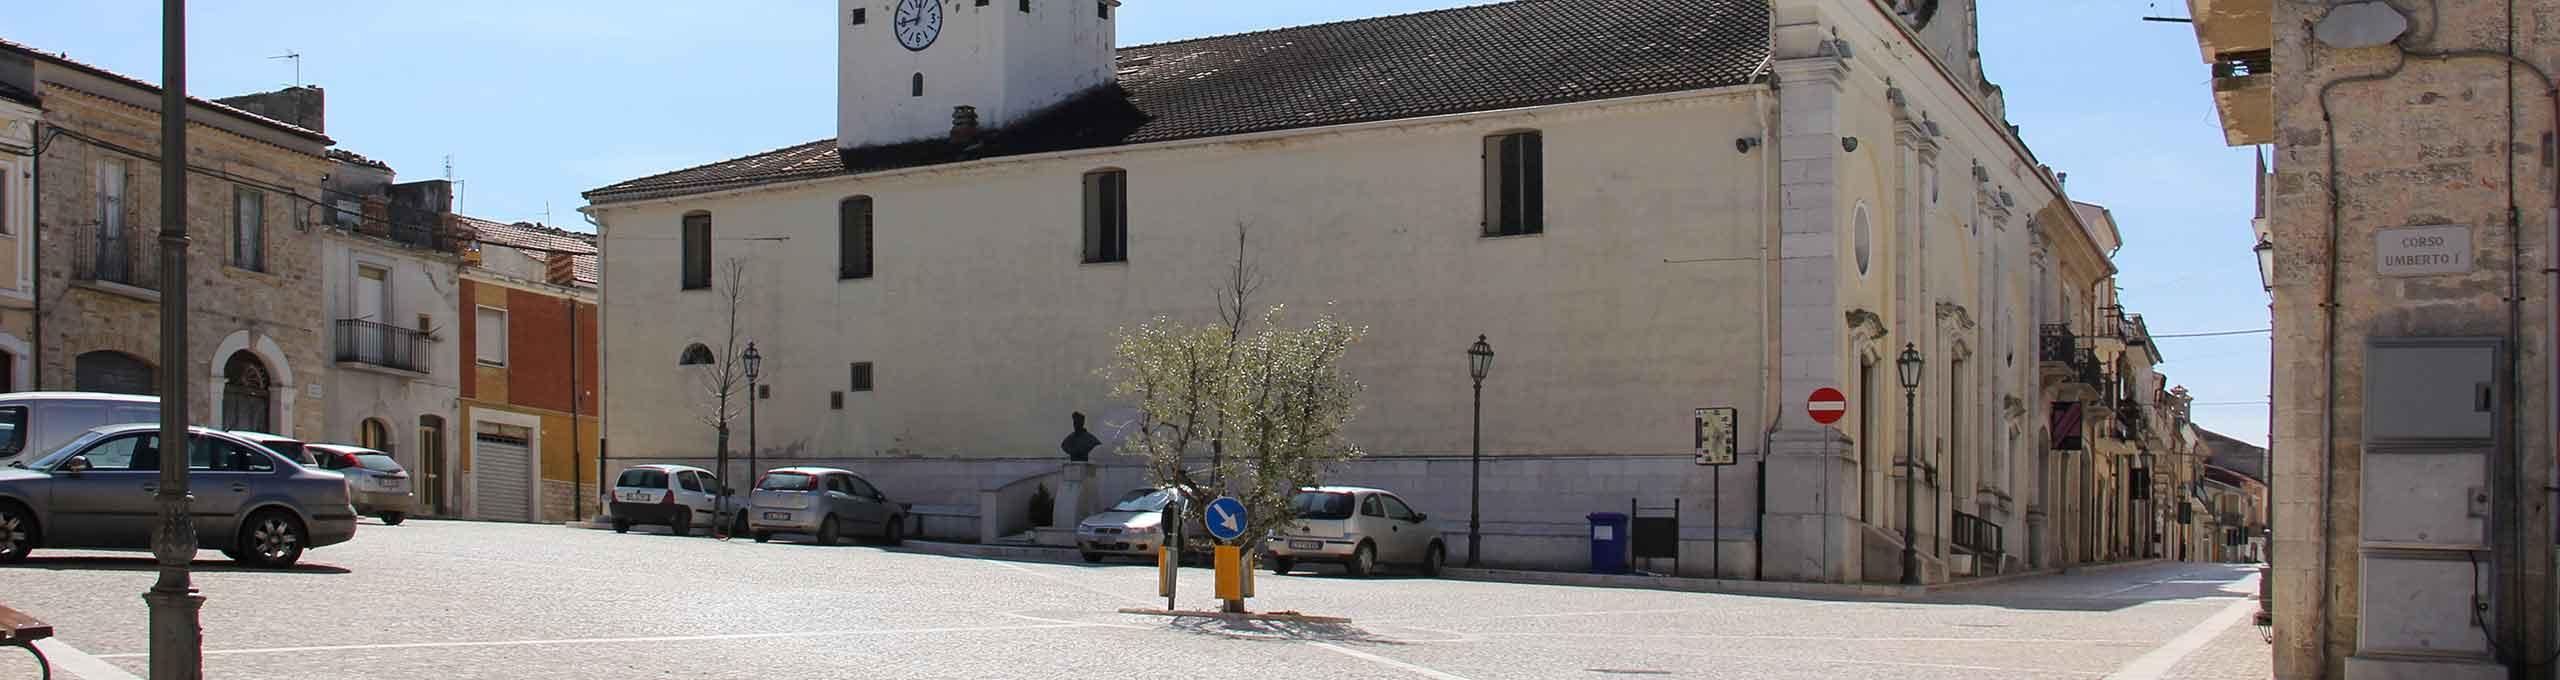 Casalnuovo Monterotaro, Monti dauni